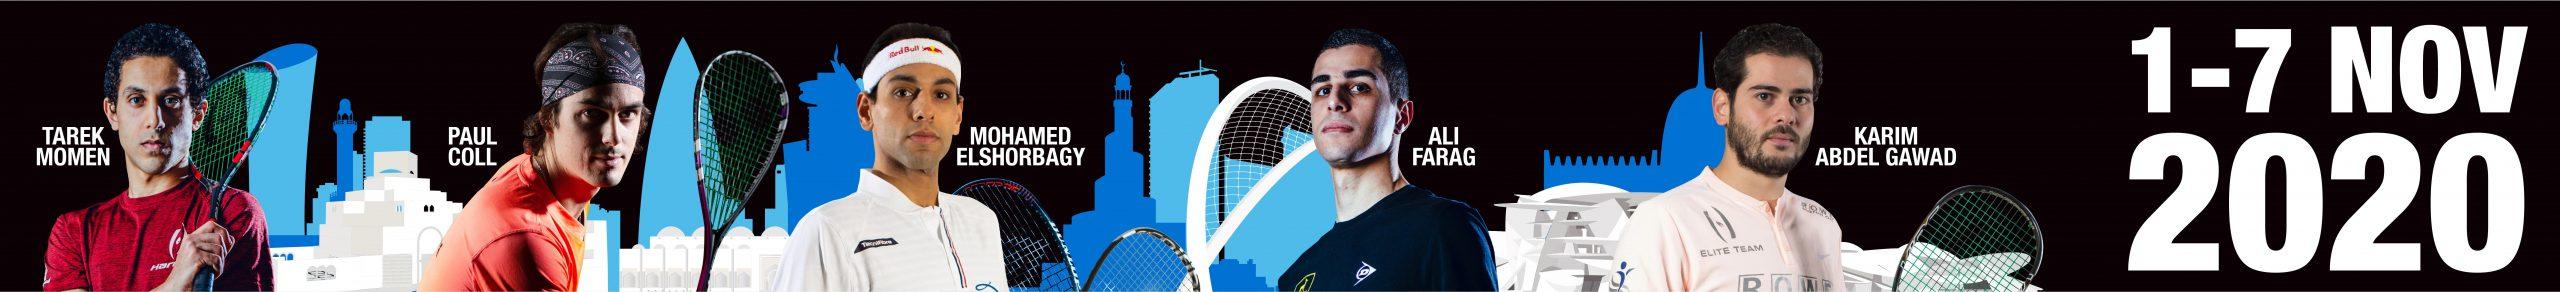 Qatar Classic Squash Championship 2020